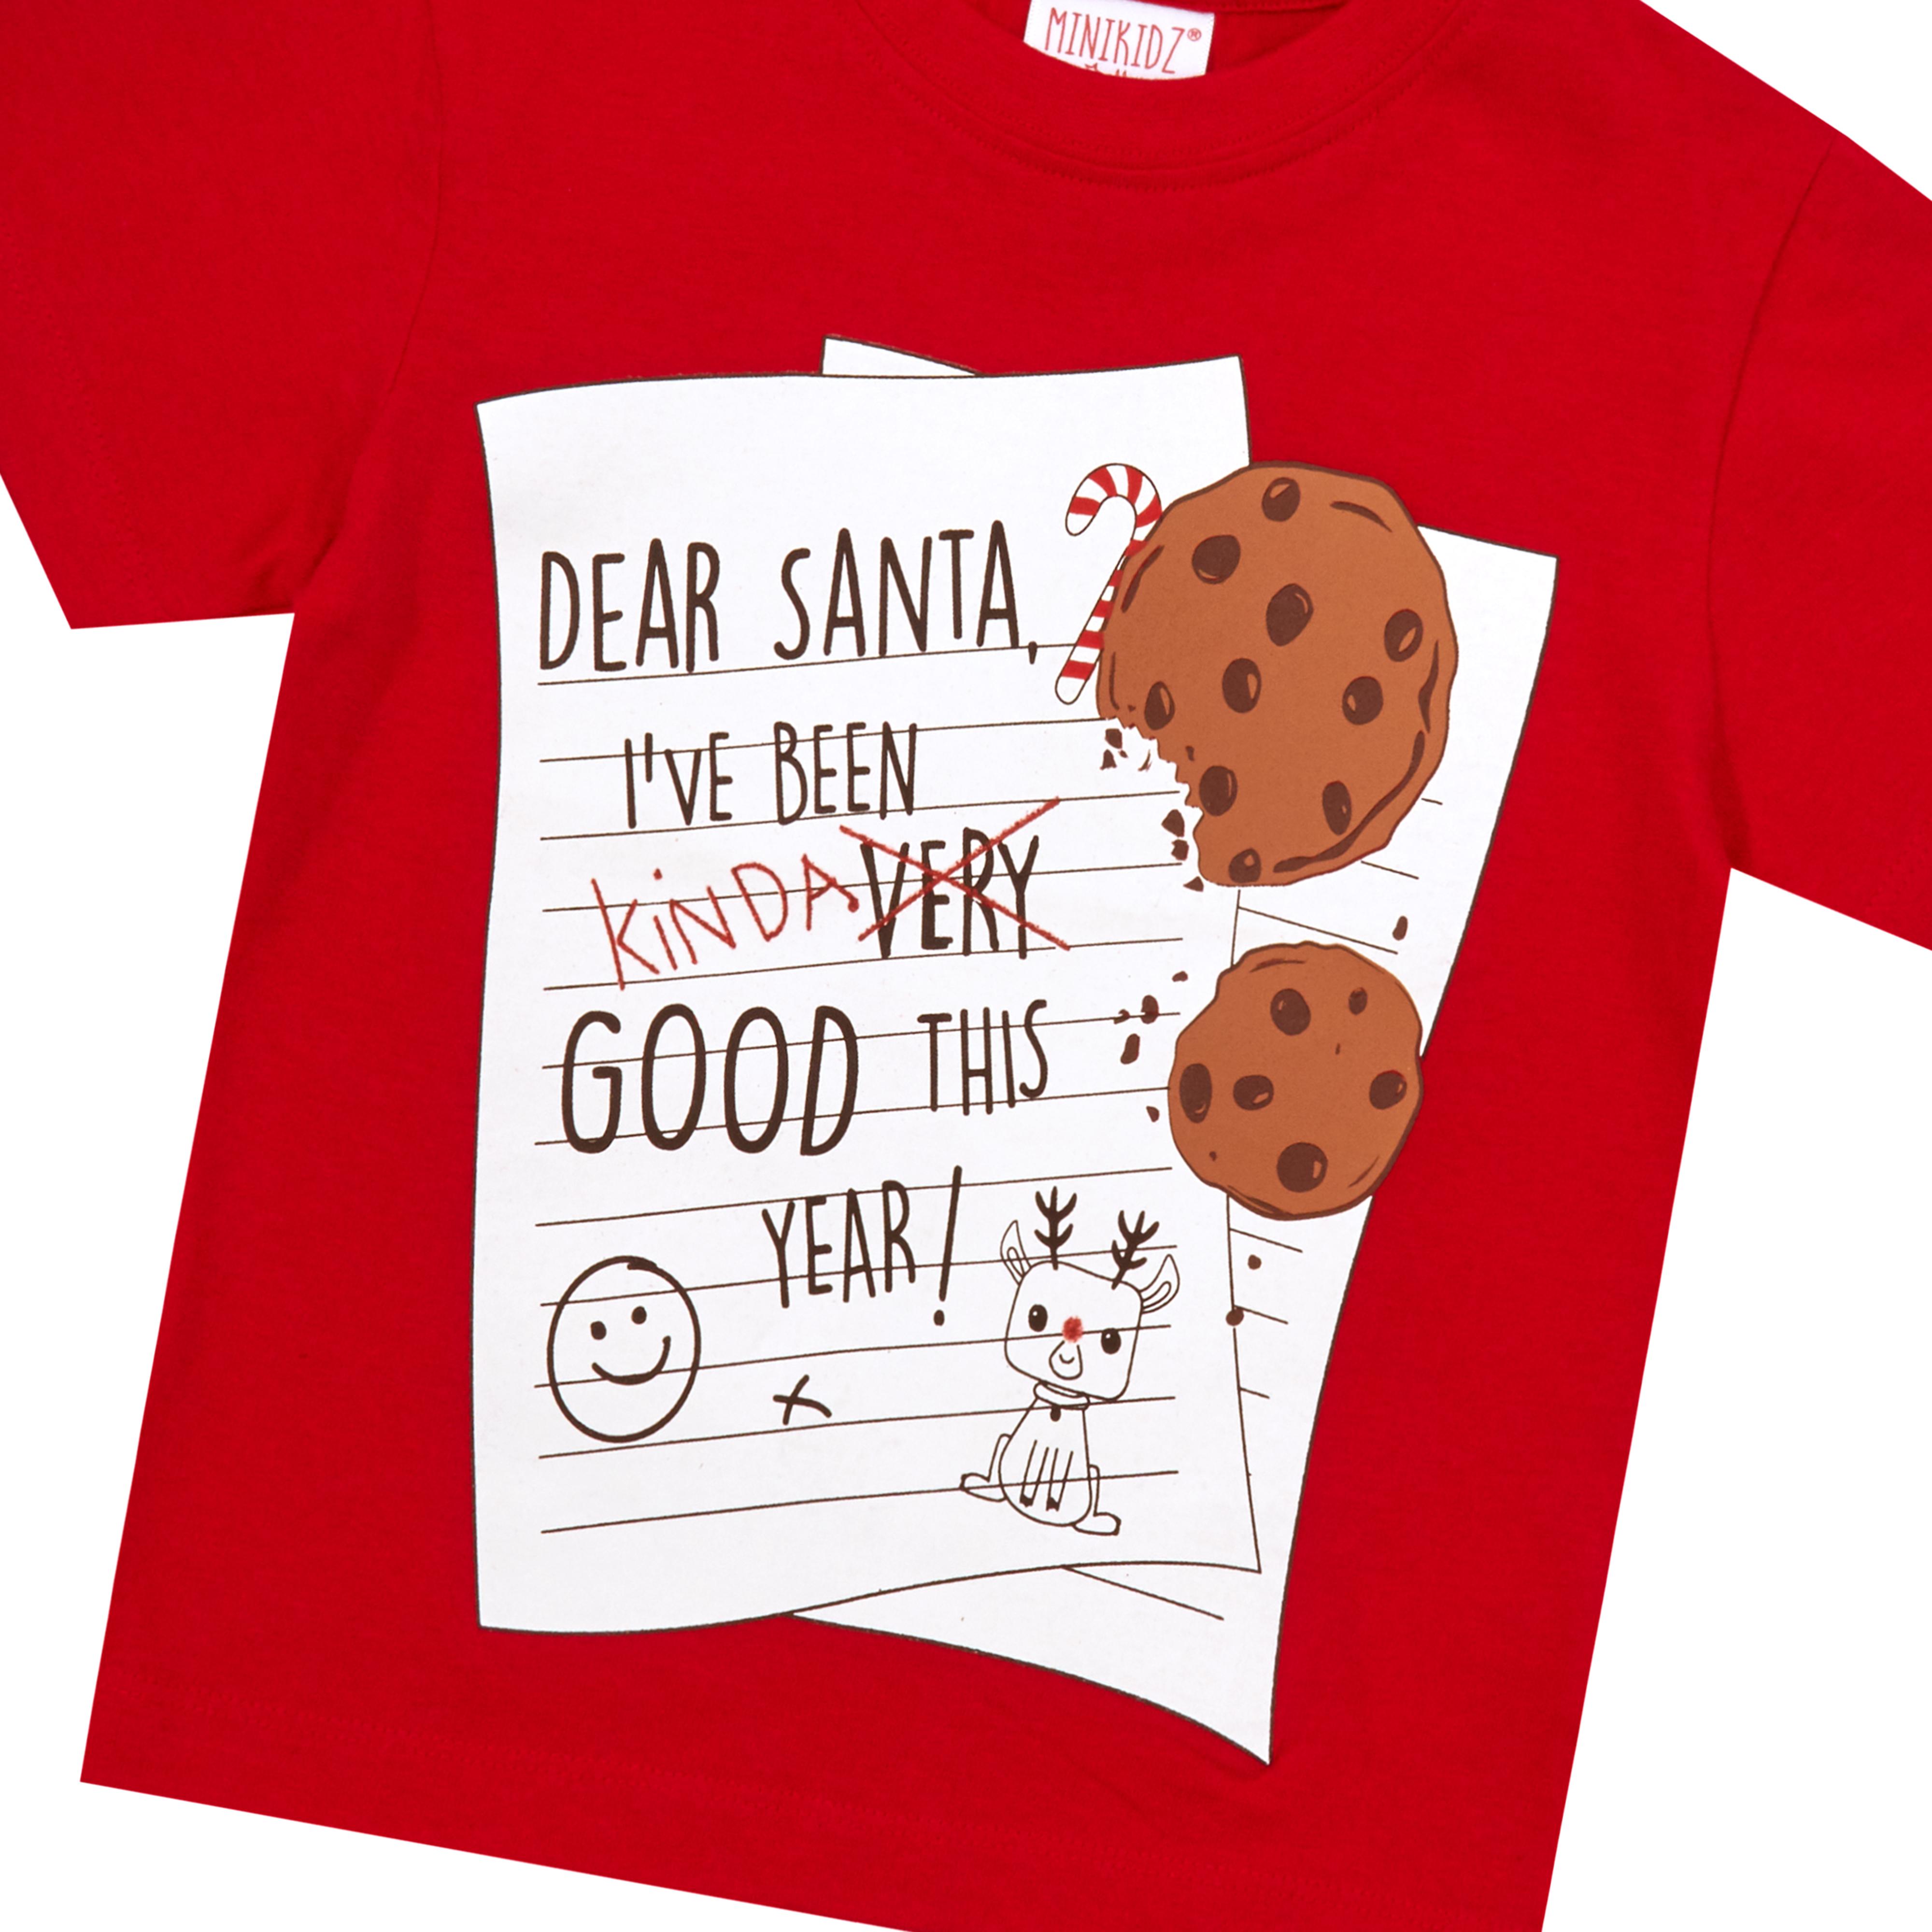 Childrens-Girls-Boys-Xmas-T-Shirts-Printed-Christmas-Design-100-Cotton-2-13-Yrs thumbnail 22